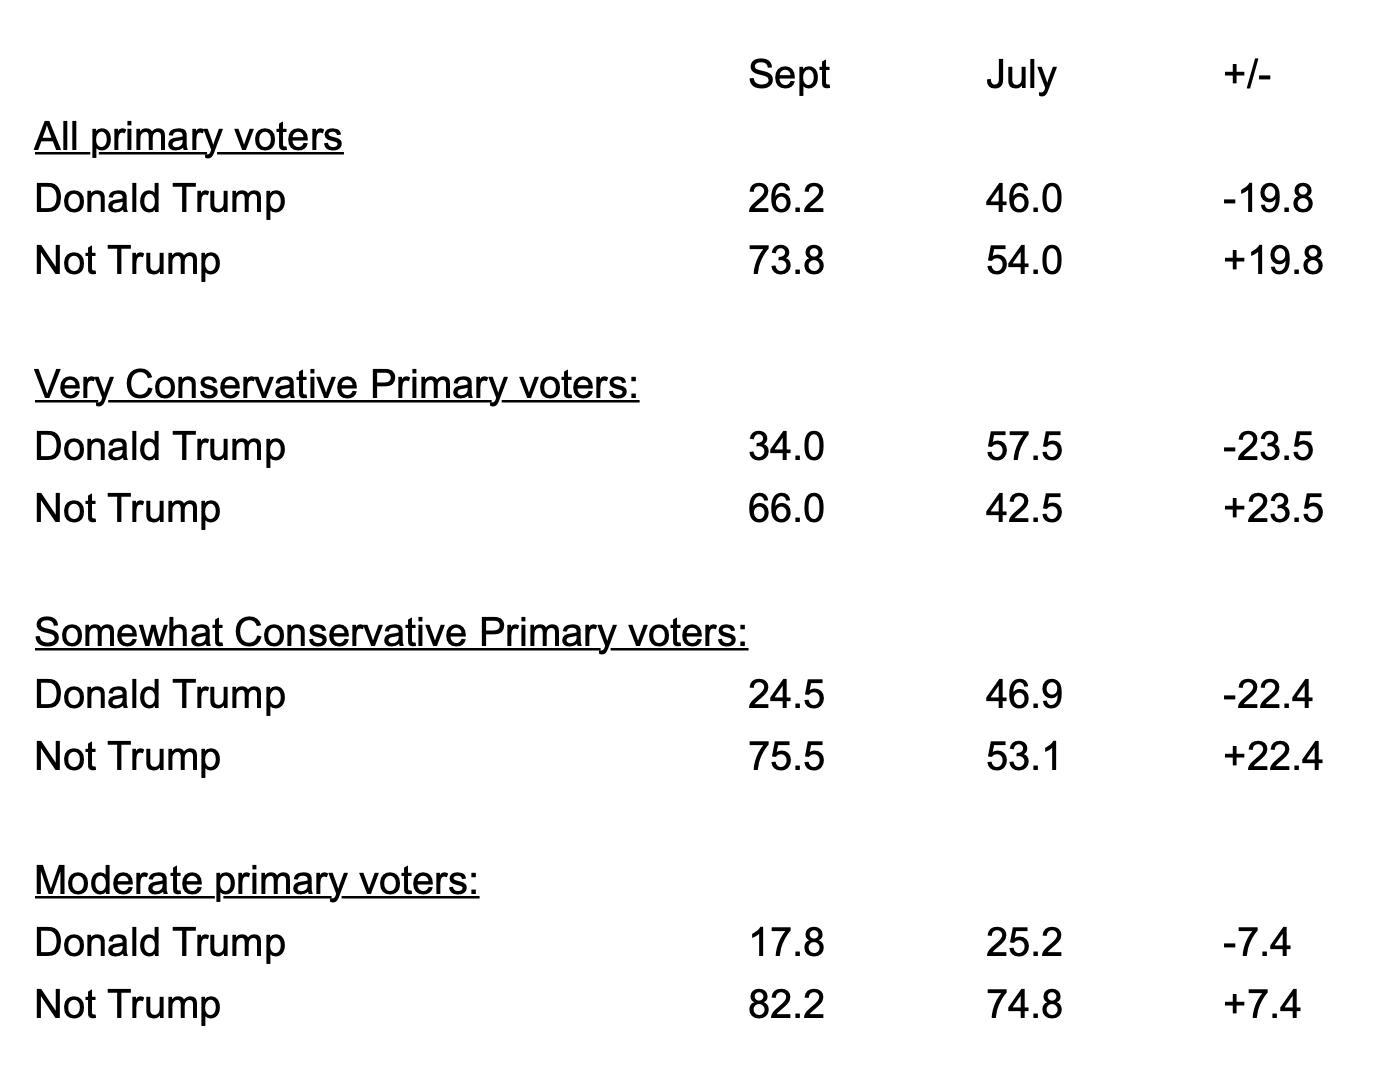 Screen-Shot-2021-09-30-at-12.08.15-PM 2024 Polls Show Trump Falling Fast As His Legacy Crumbles Coronavirus Donald Trump Featured Politics Polls Top Stories